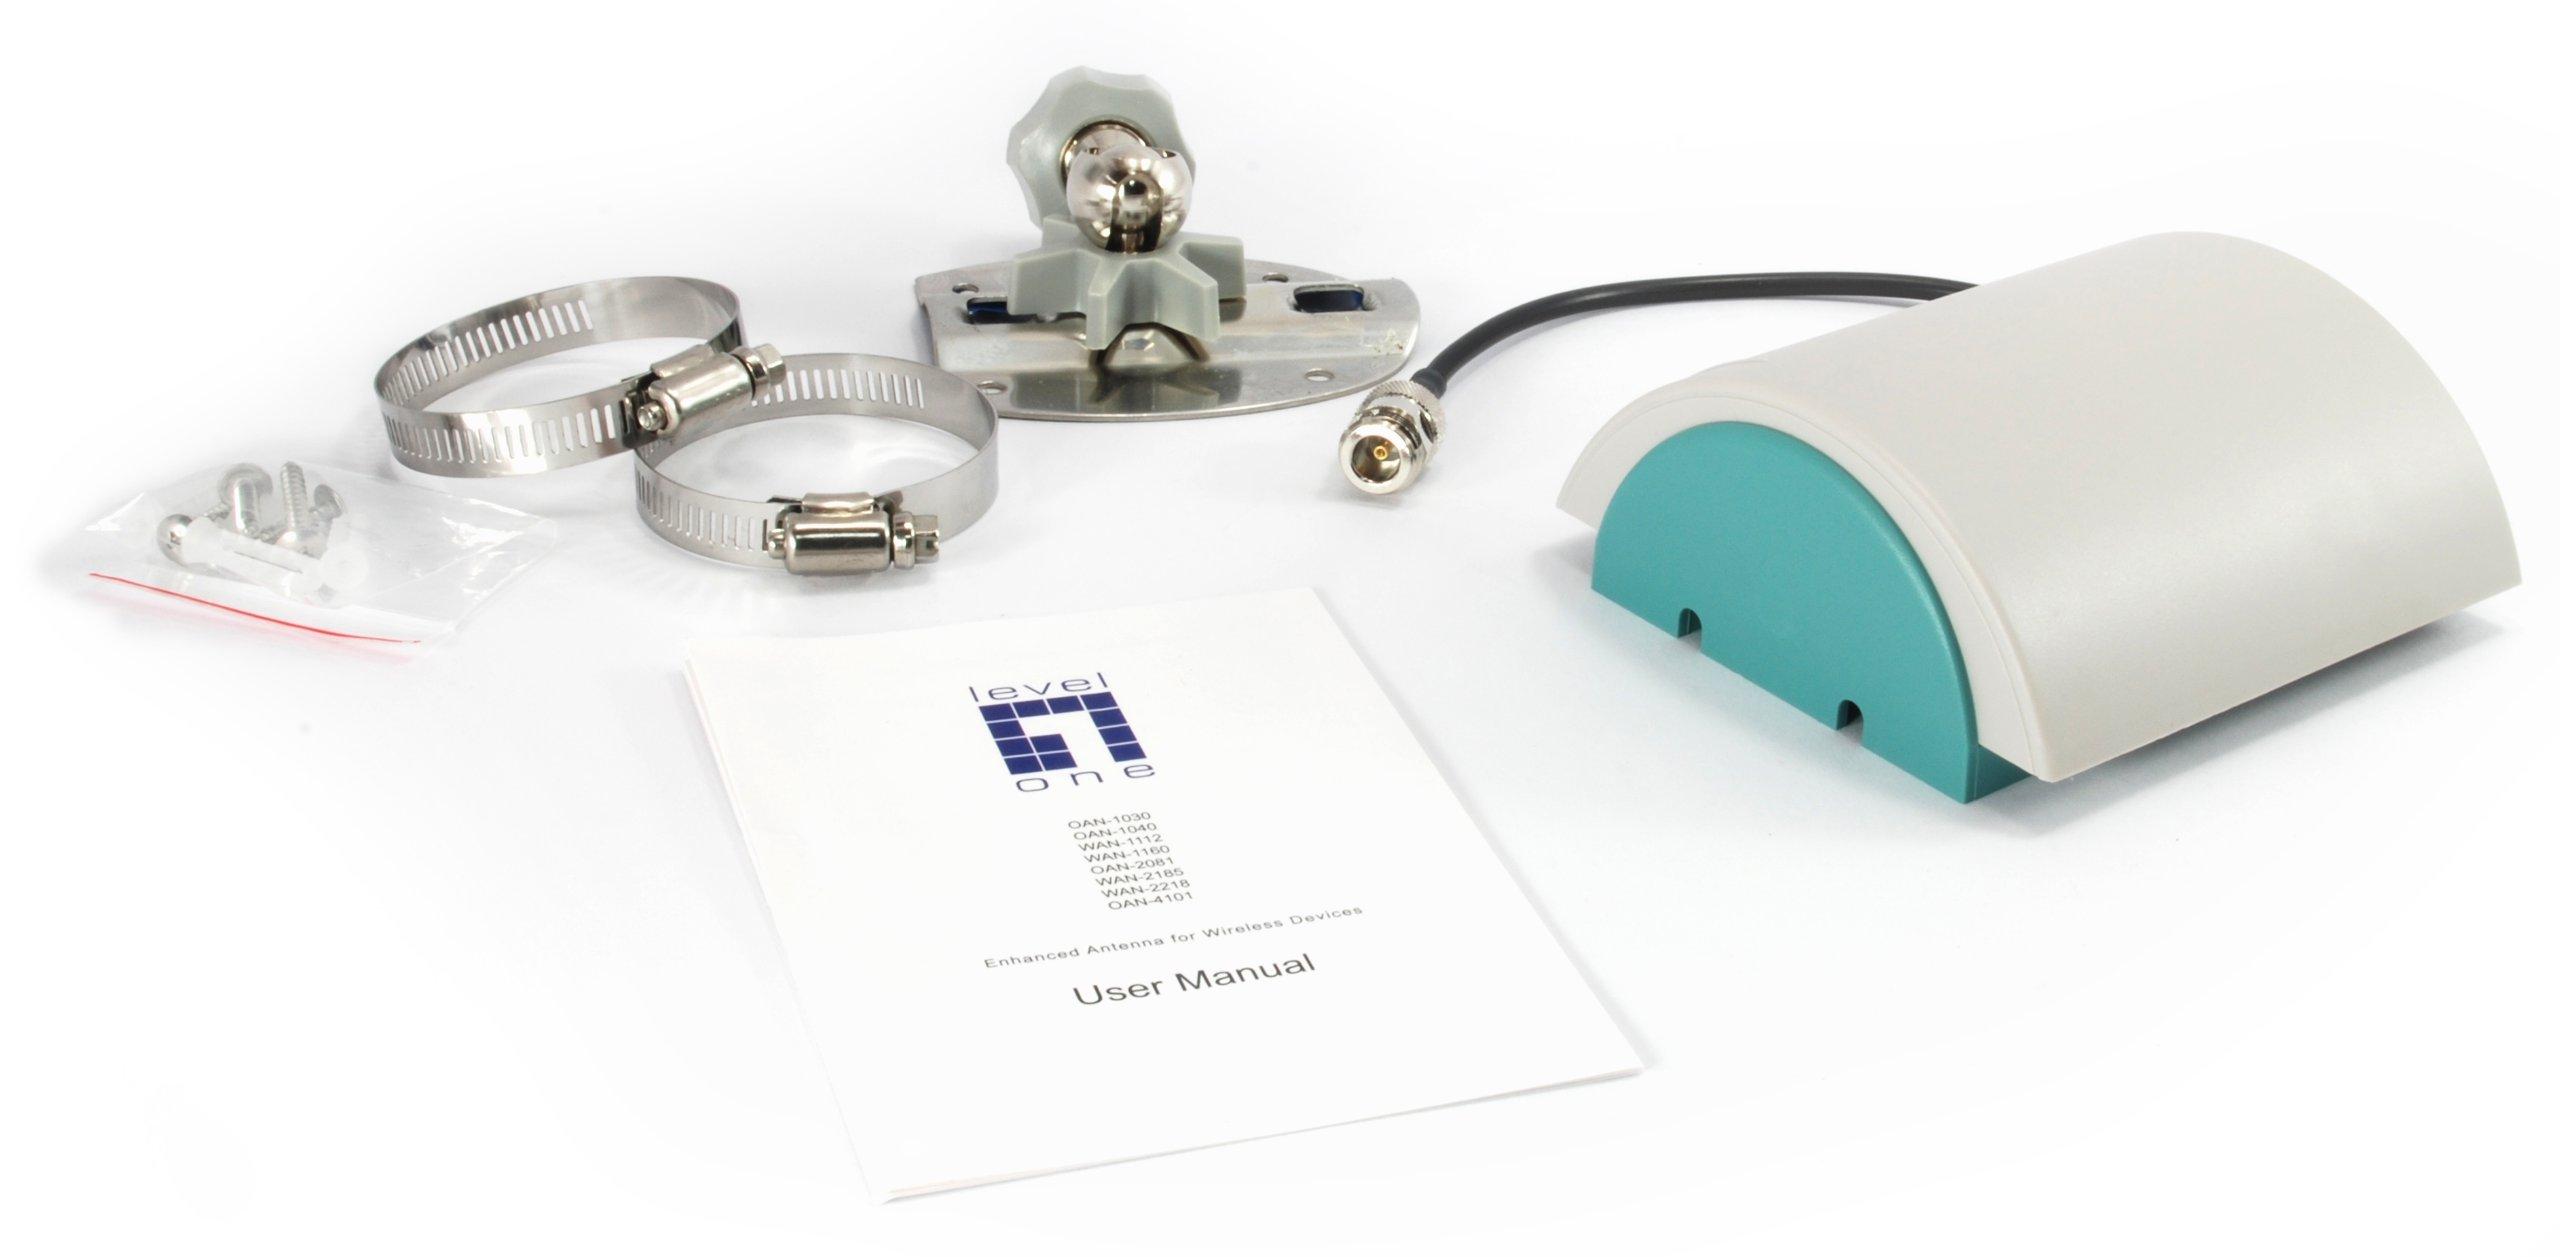 CP Technologies 8.5dBi Pico Cell Antenna 2.4GHz (WAN-2185)